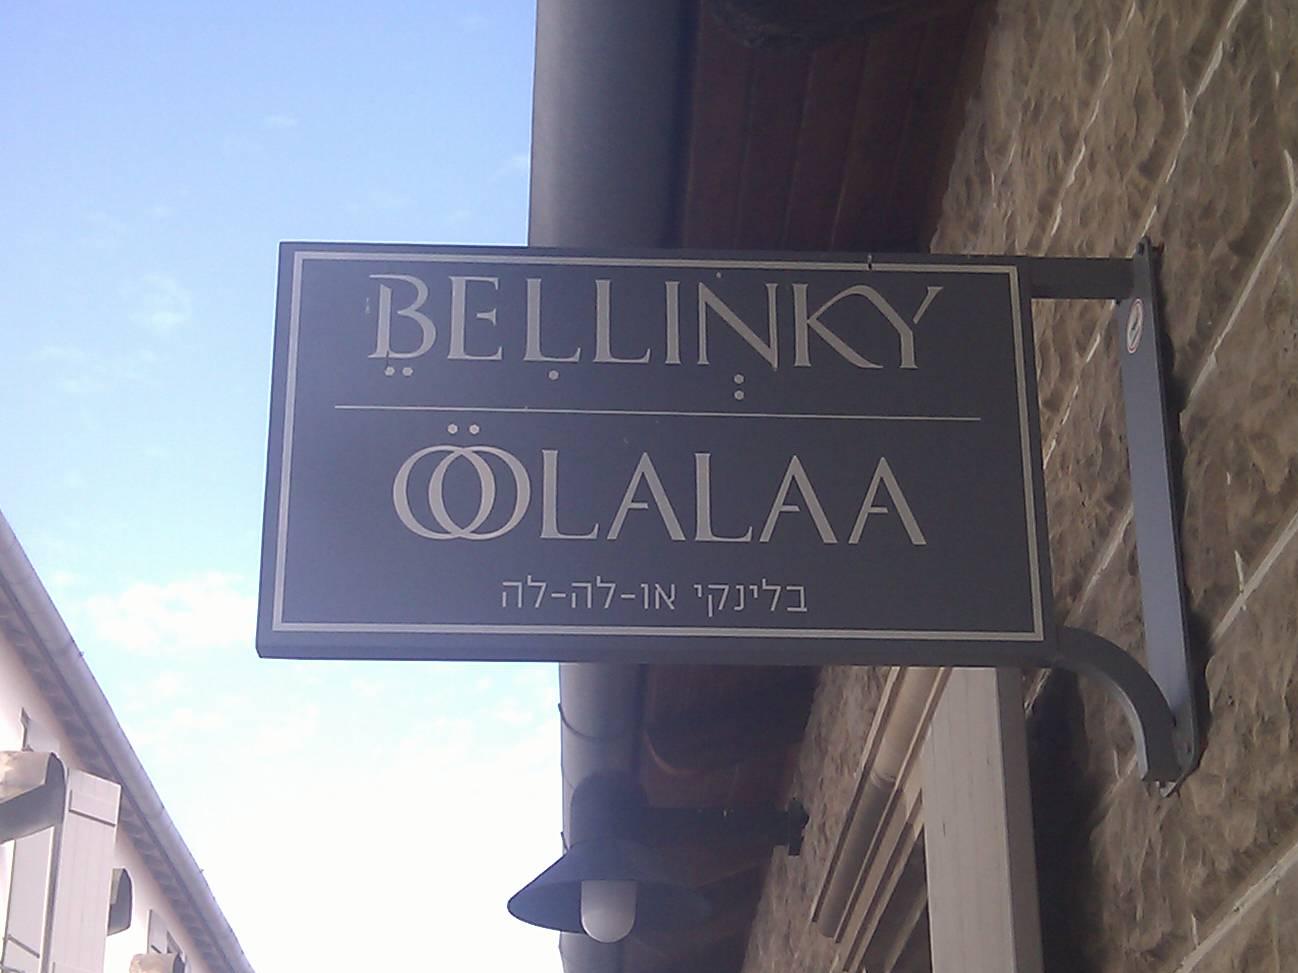 Bellinky Oolalaa